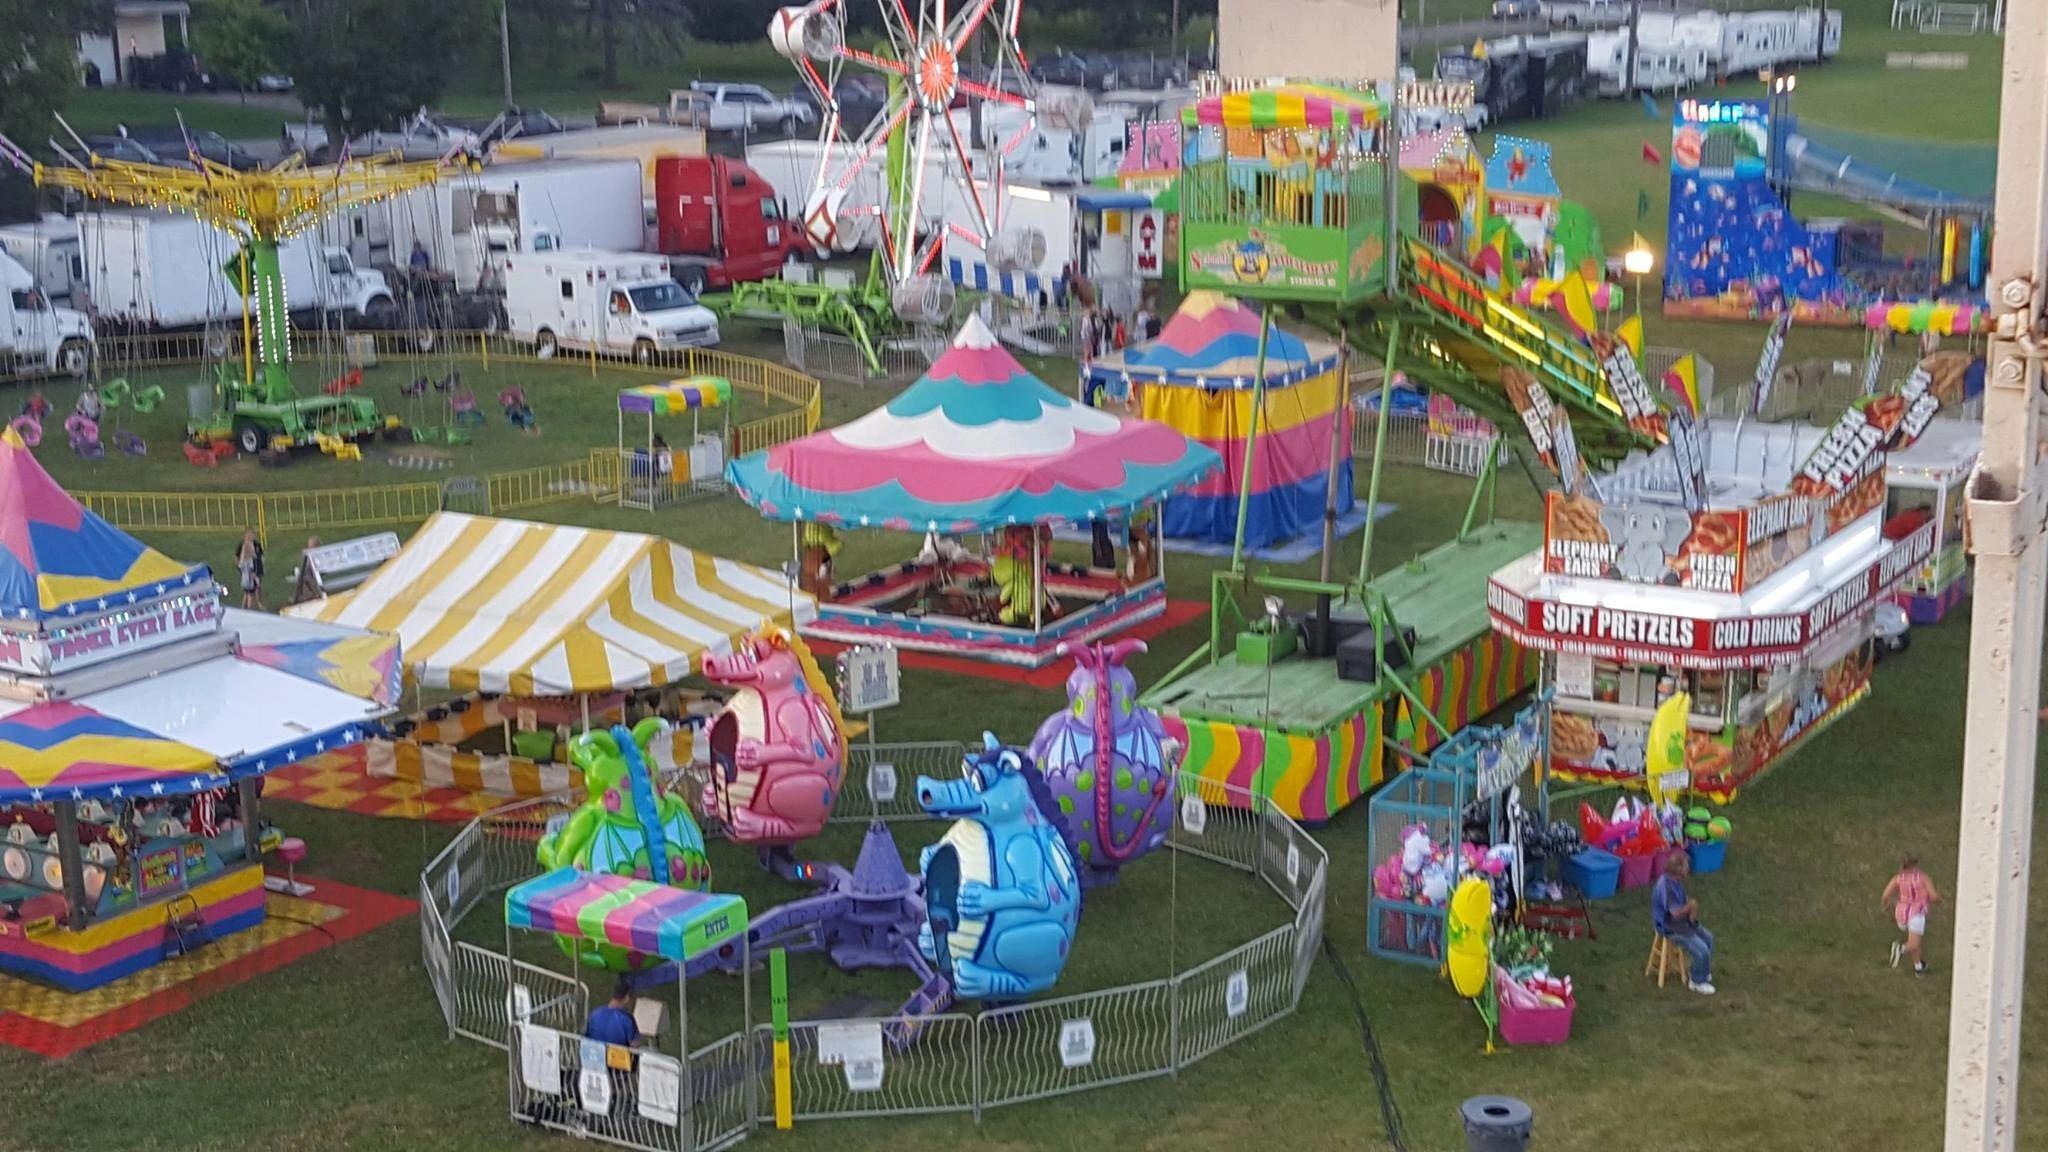 Saline Community Fair 2020.Manchester Community Fair